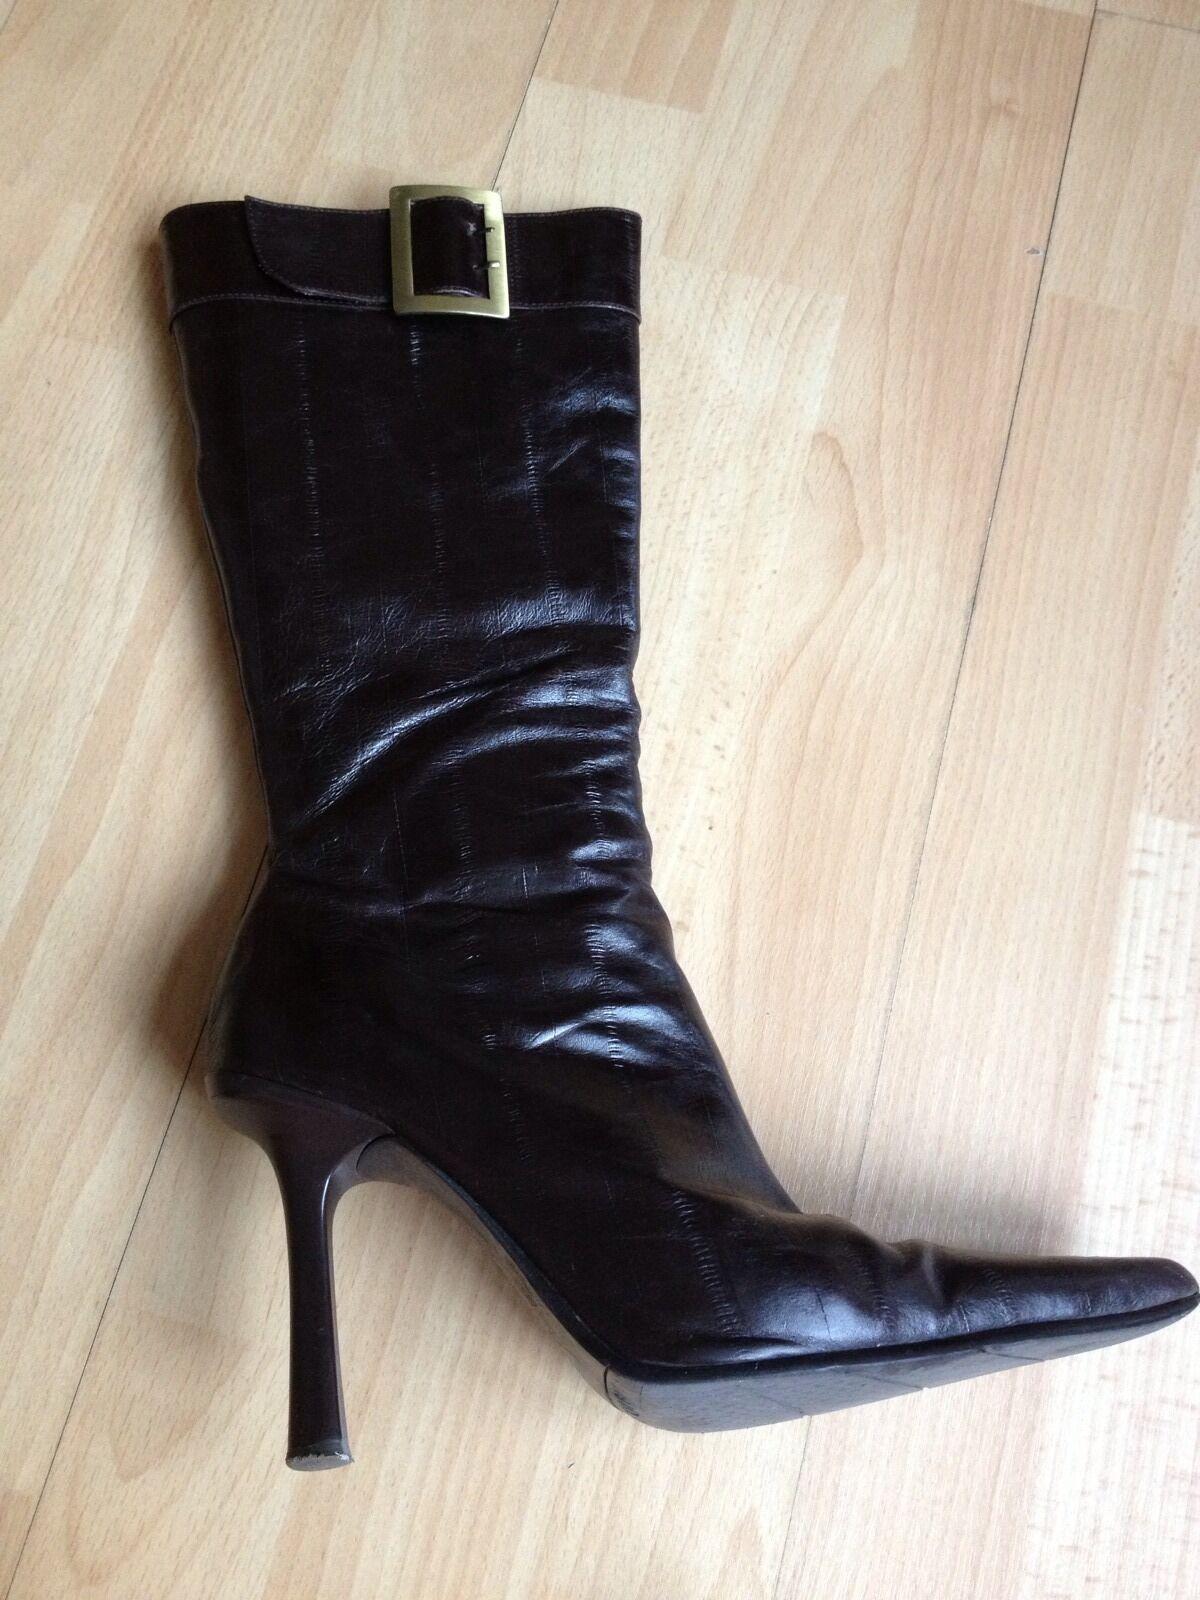 Lovely Aldo Dark Braun Leder Long Stiefel, Größe UK3 -